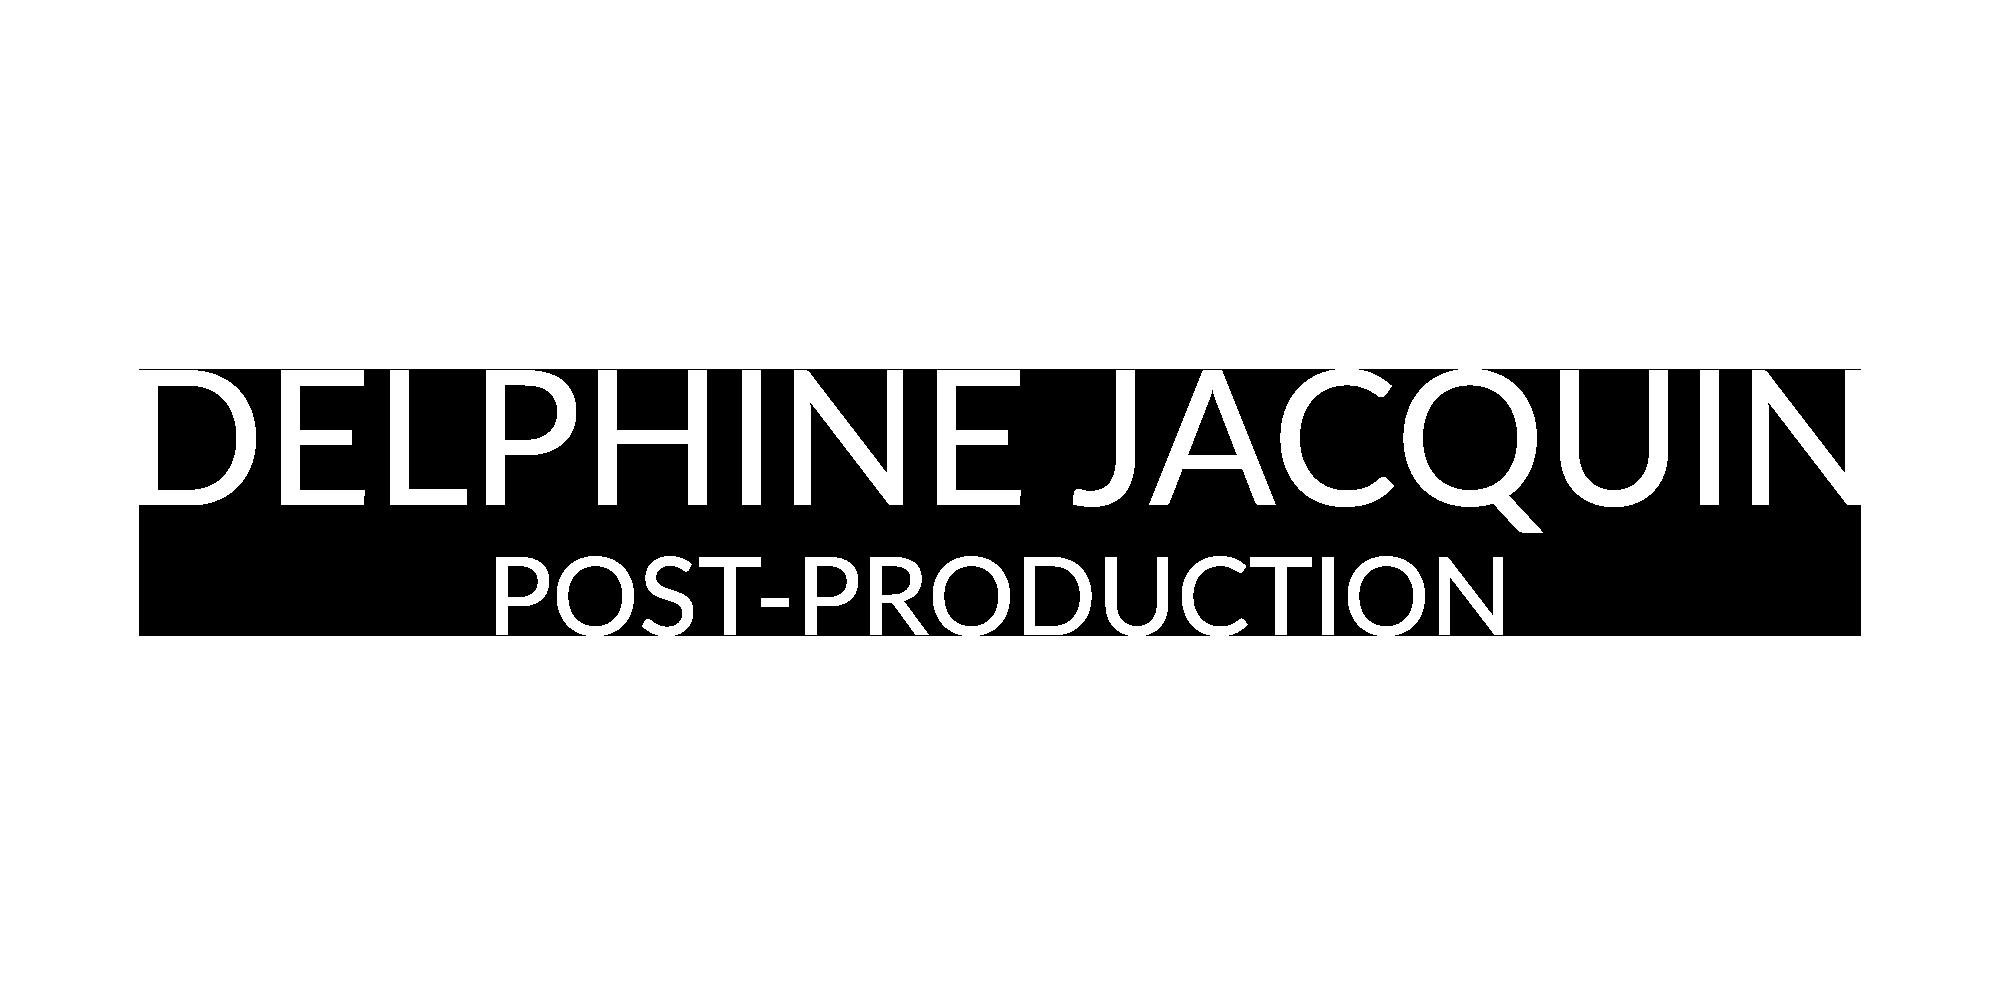 Delphine Jacquin